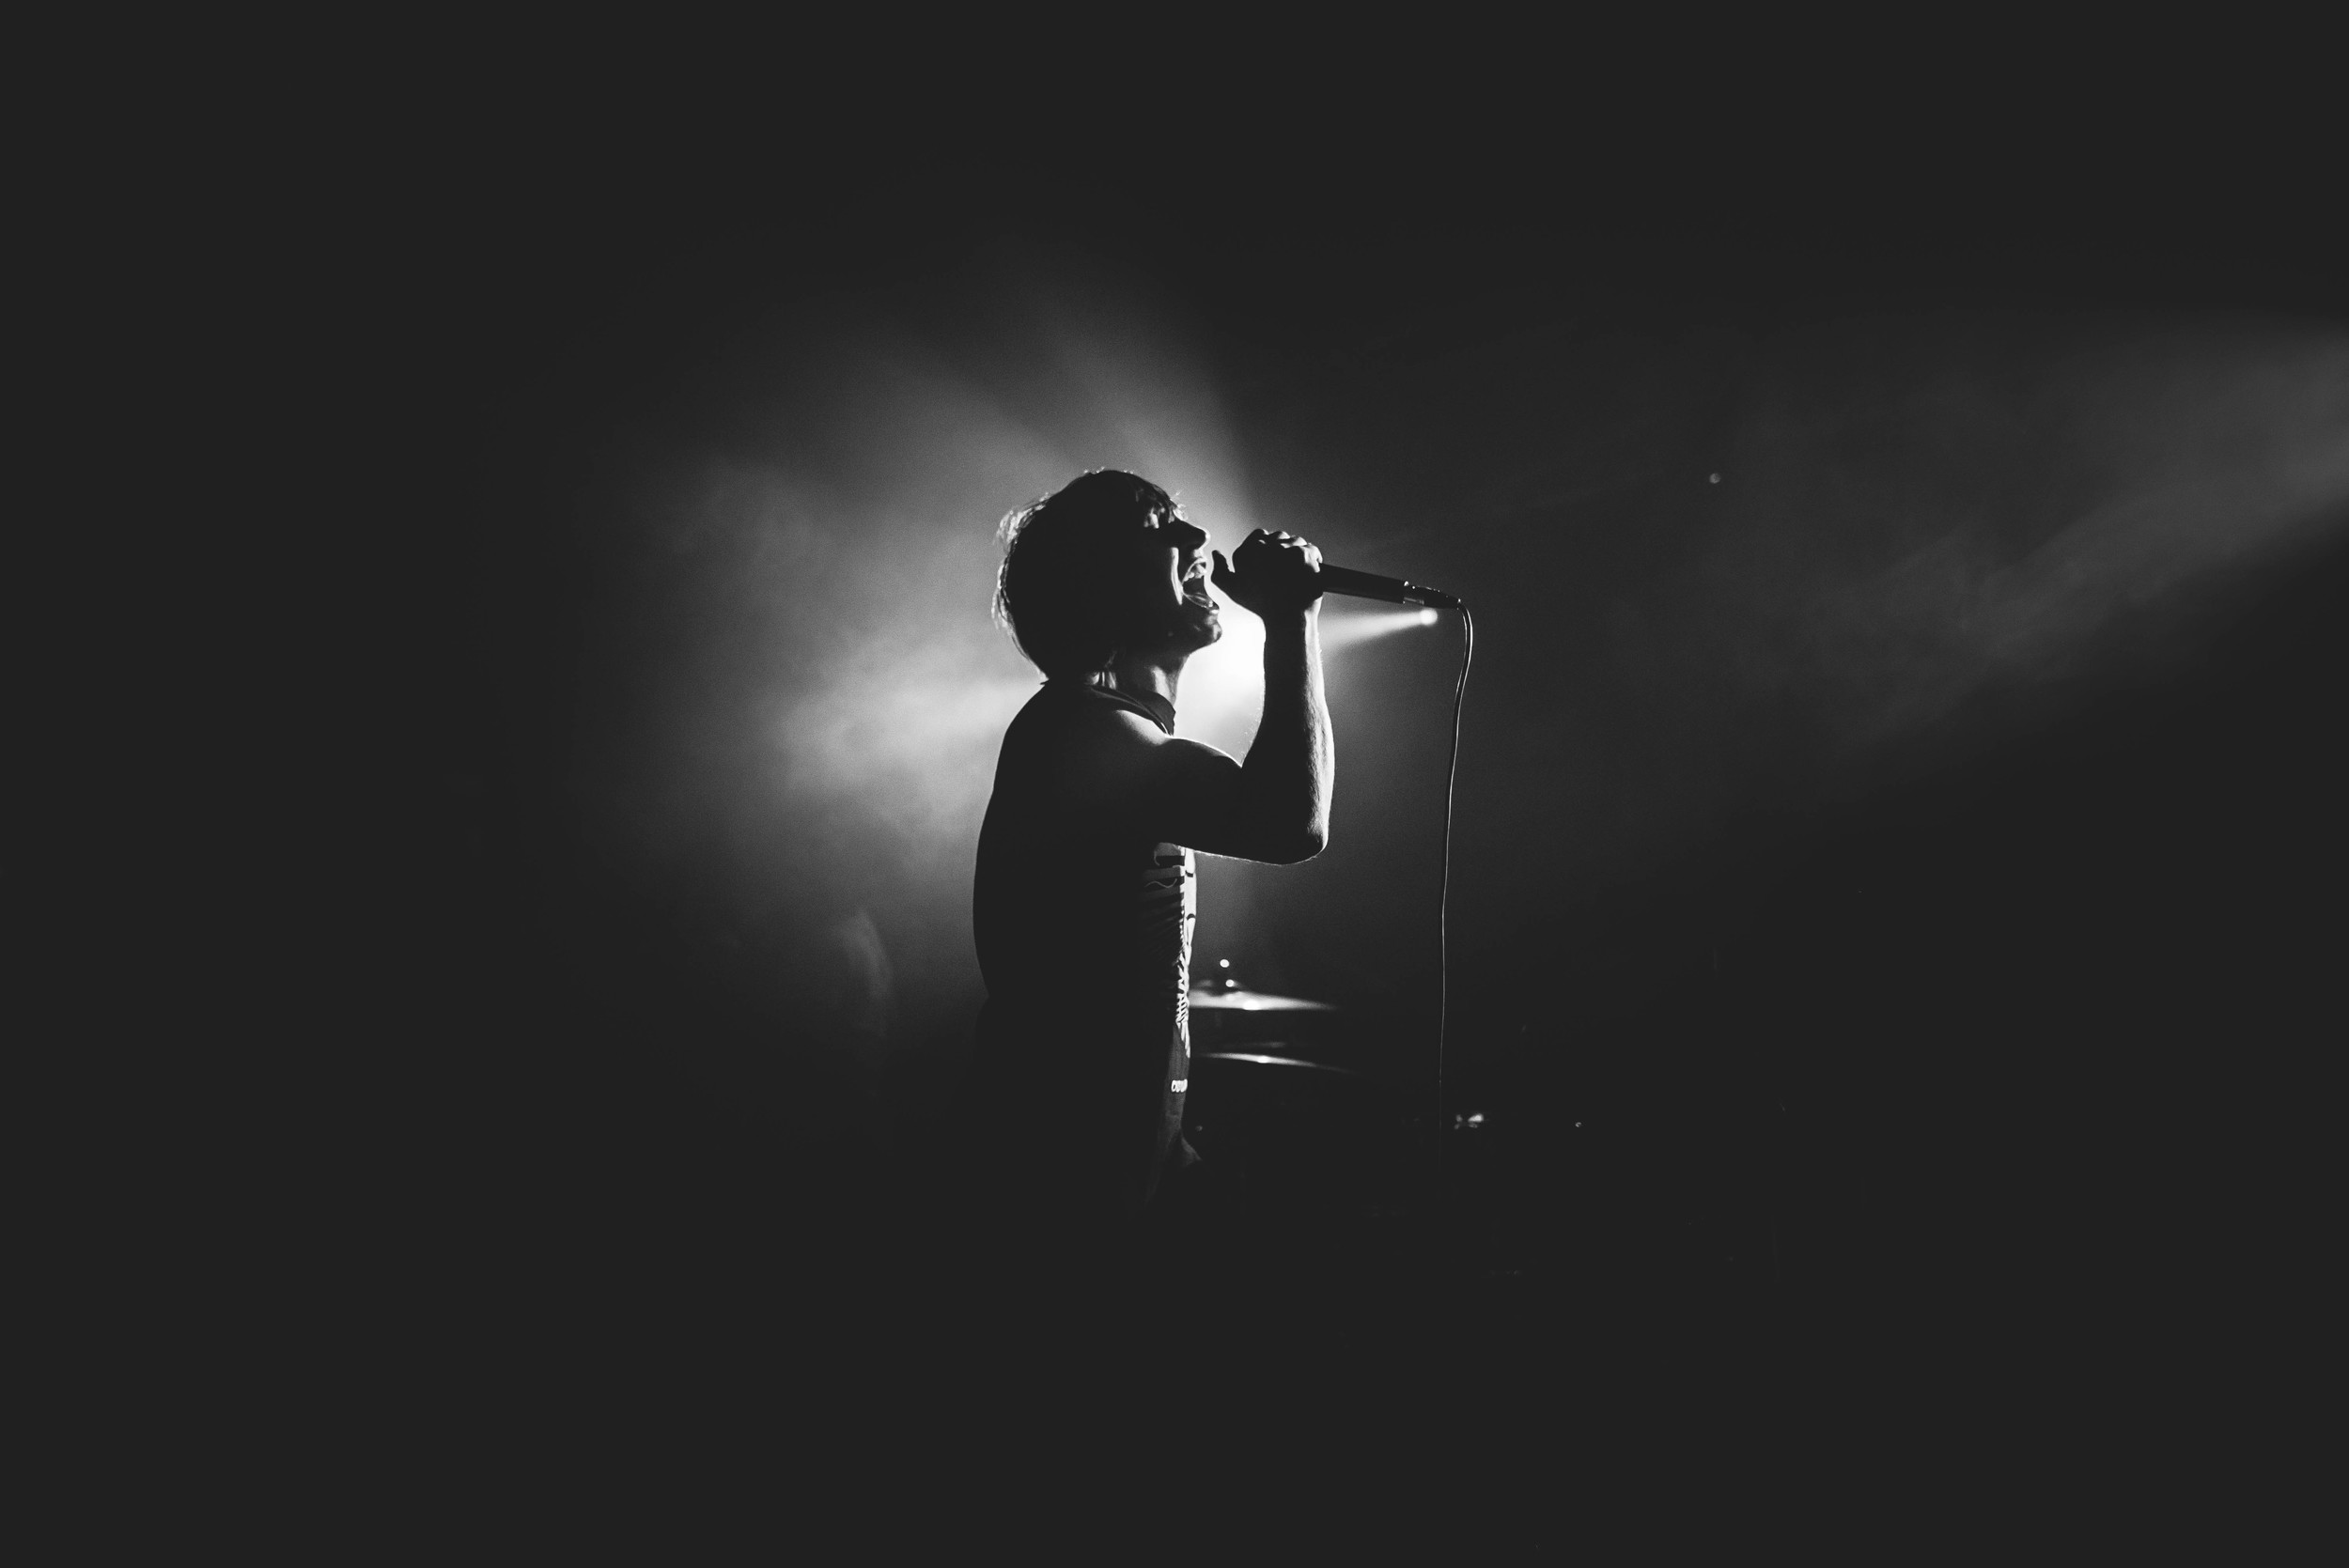 JH_musicphotography-4170.jpg